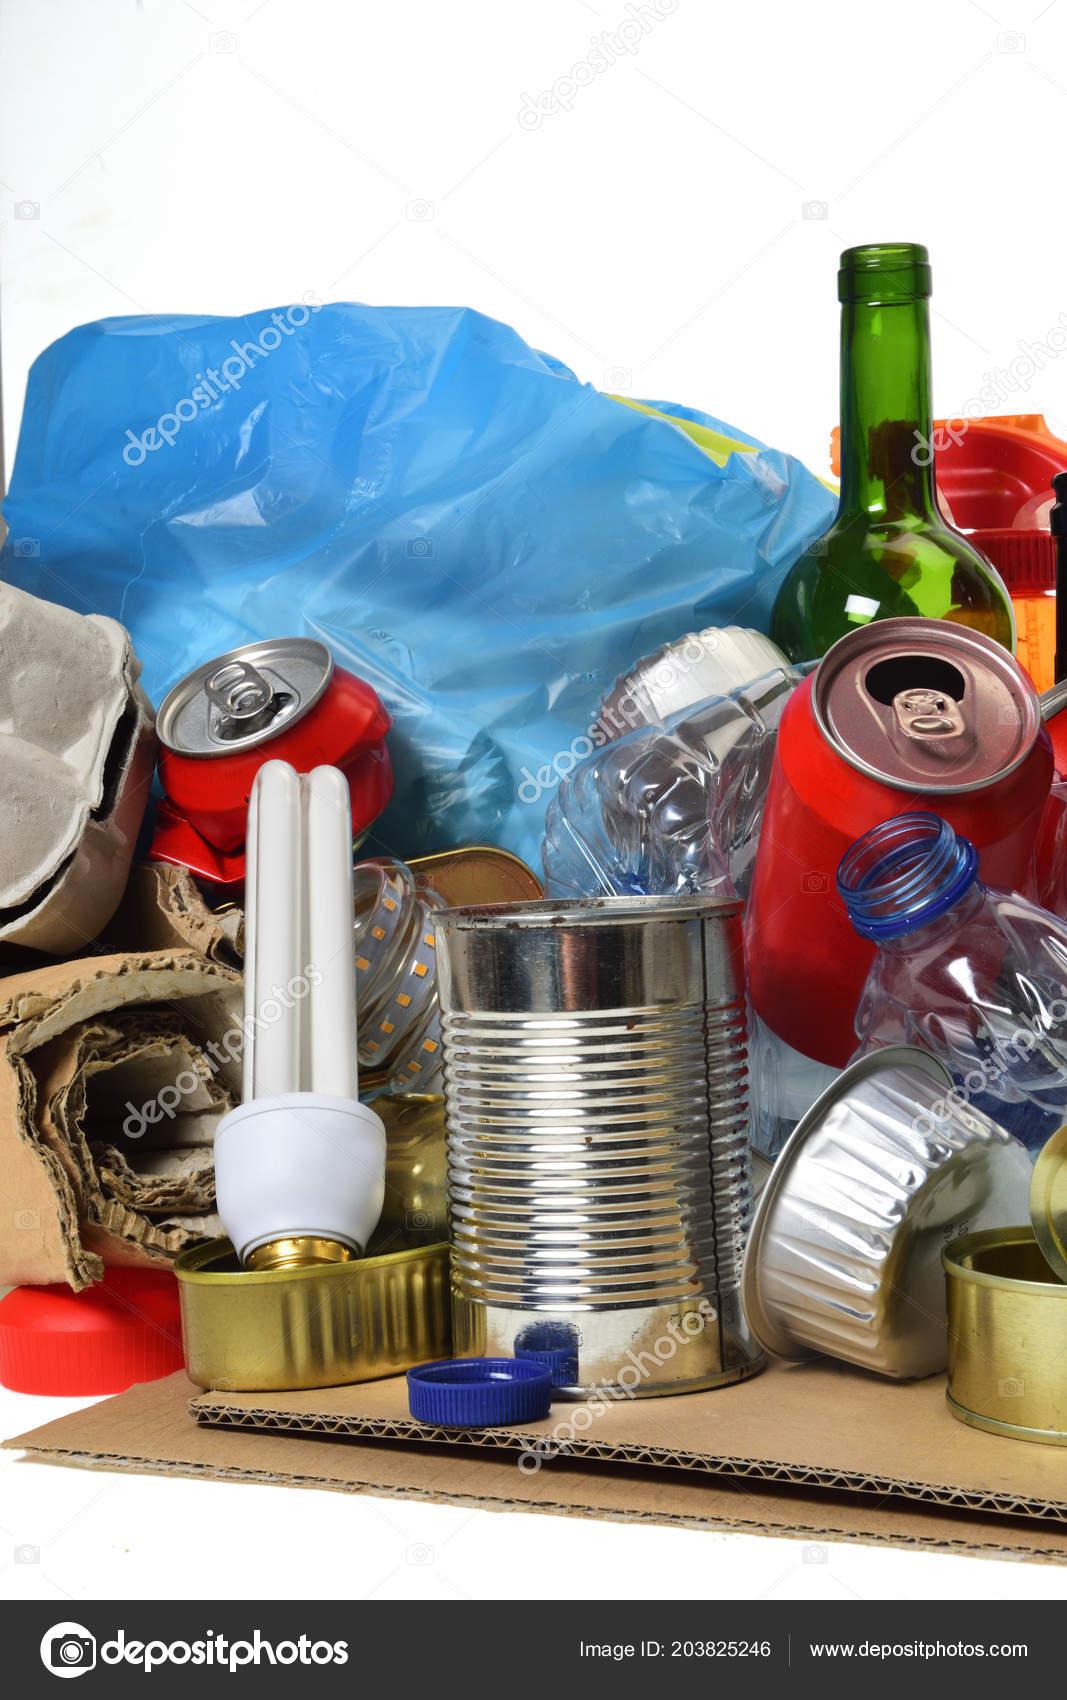 42684edf8850 Κάδος Για Ανακύκλωση Χαρτί Γυαλί Φιάλες Πλαστικό Μπουκάλι Και Λάμπα ...